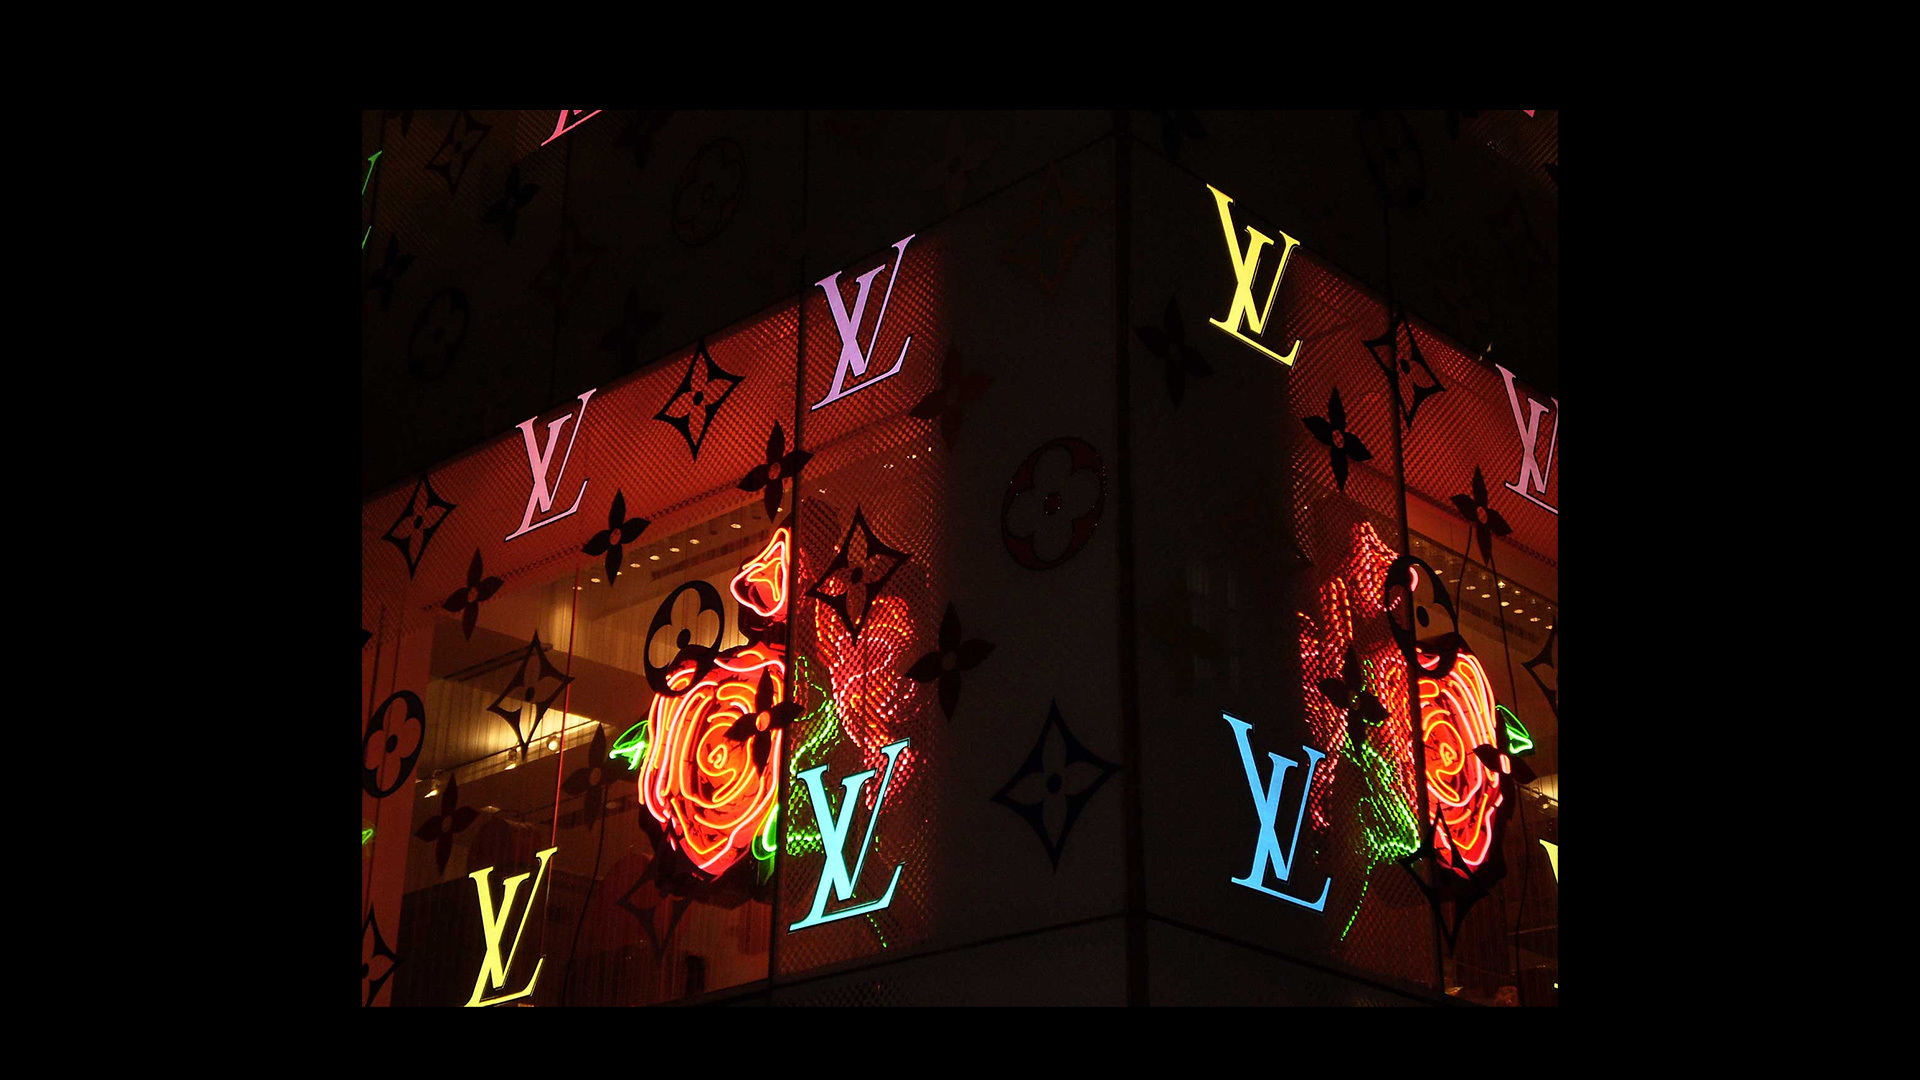 Louis Vuitton Roses